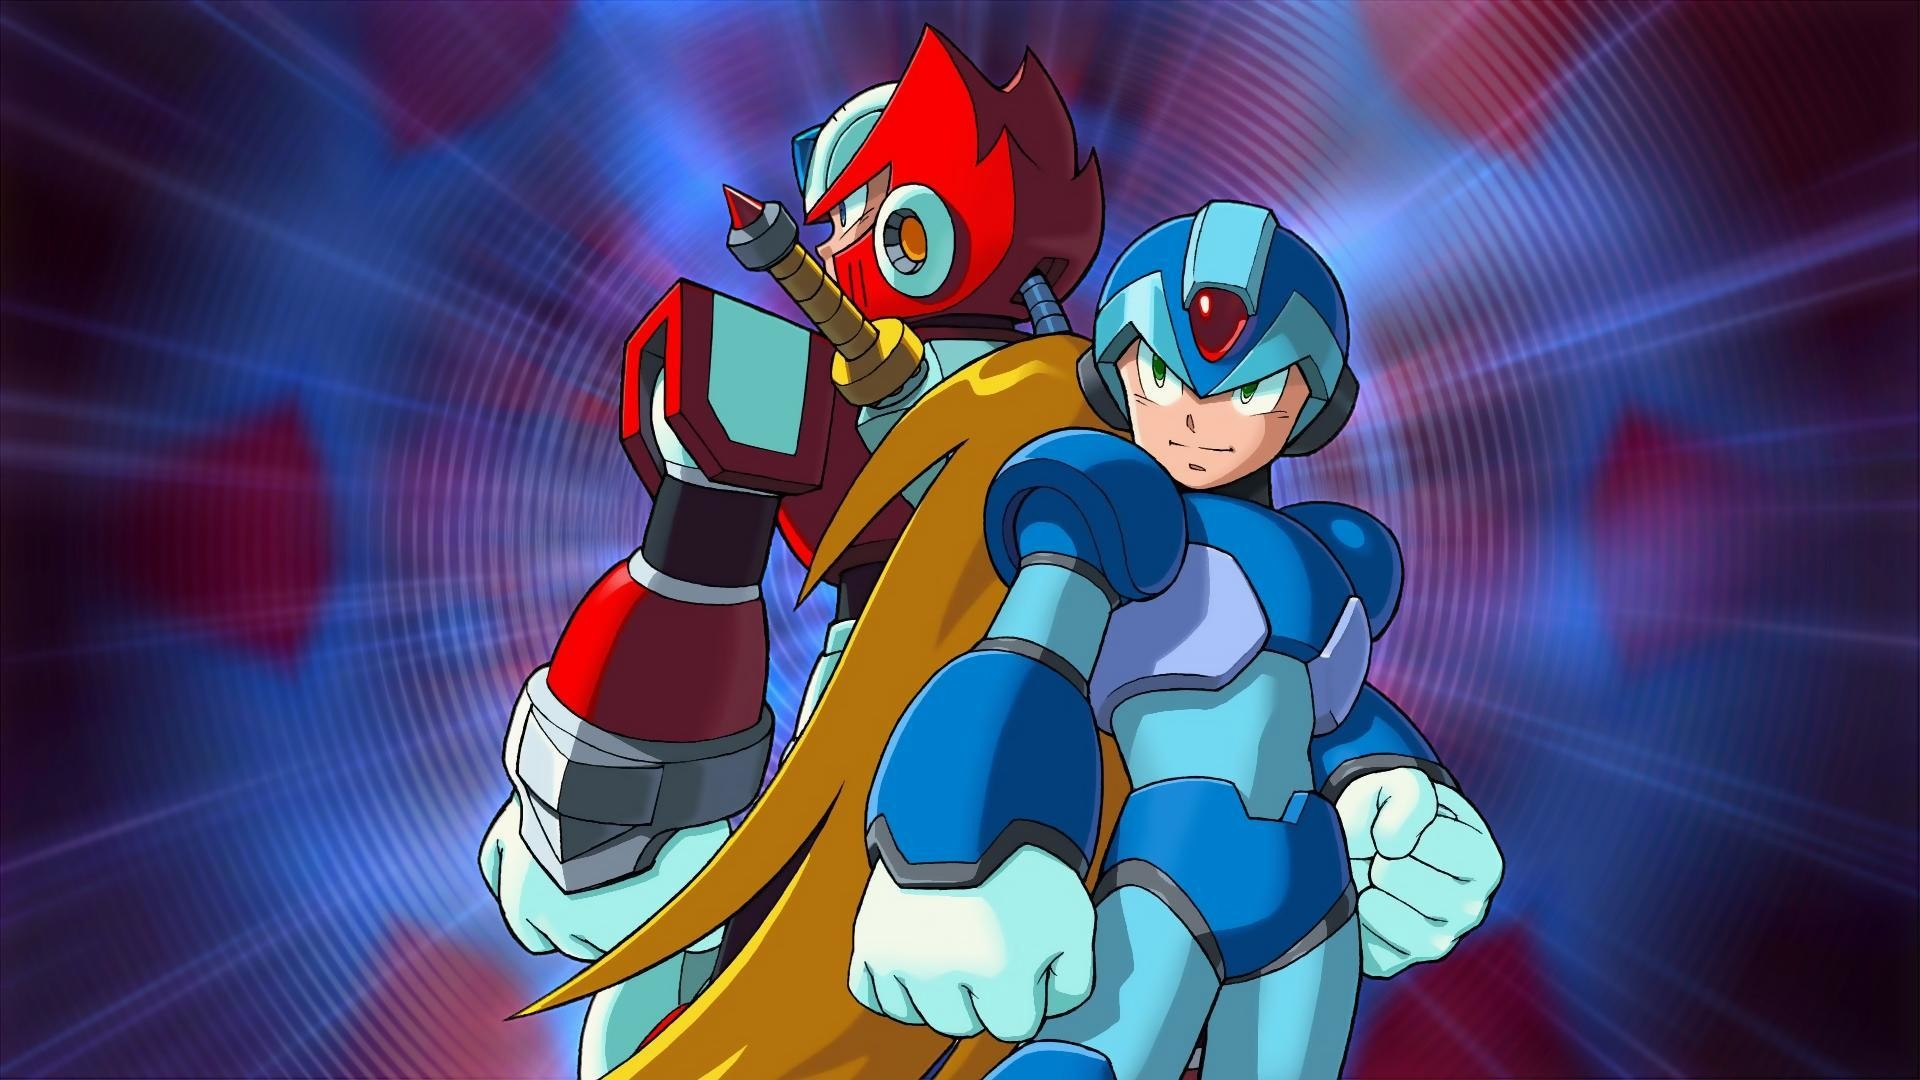 Megaman-Wallpaper-HD-For-Desktop